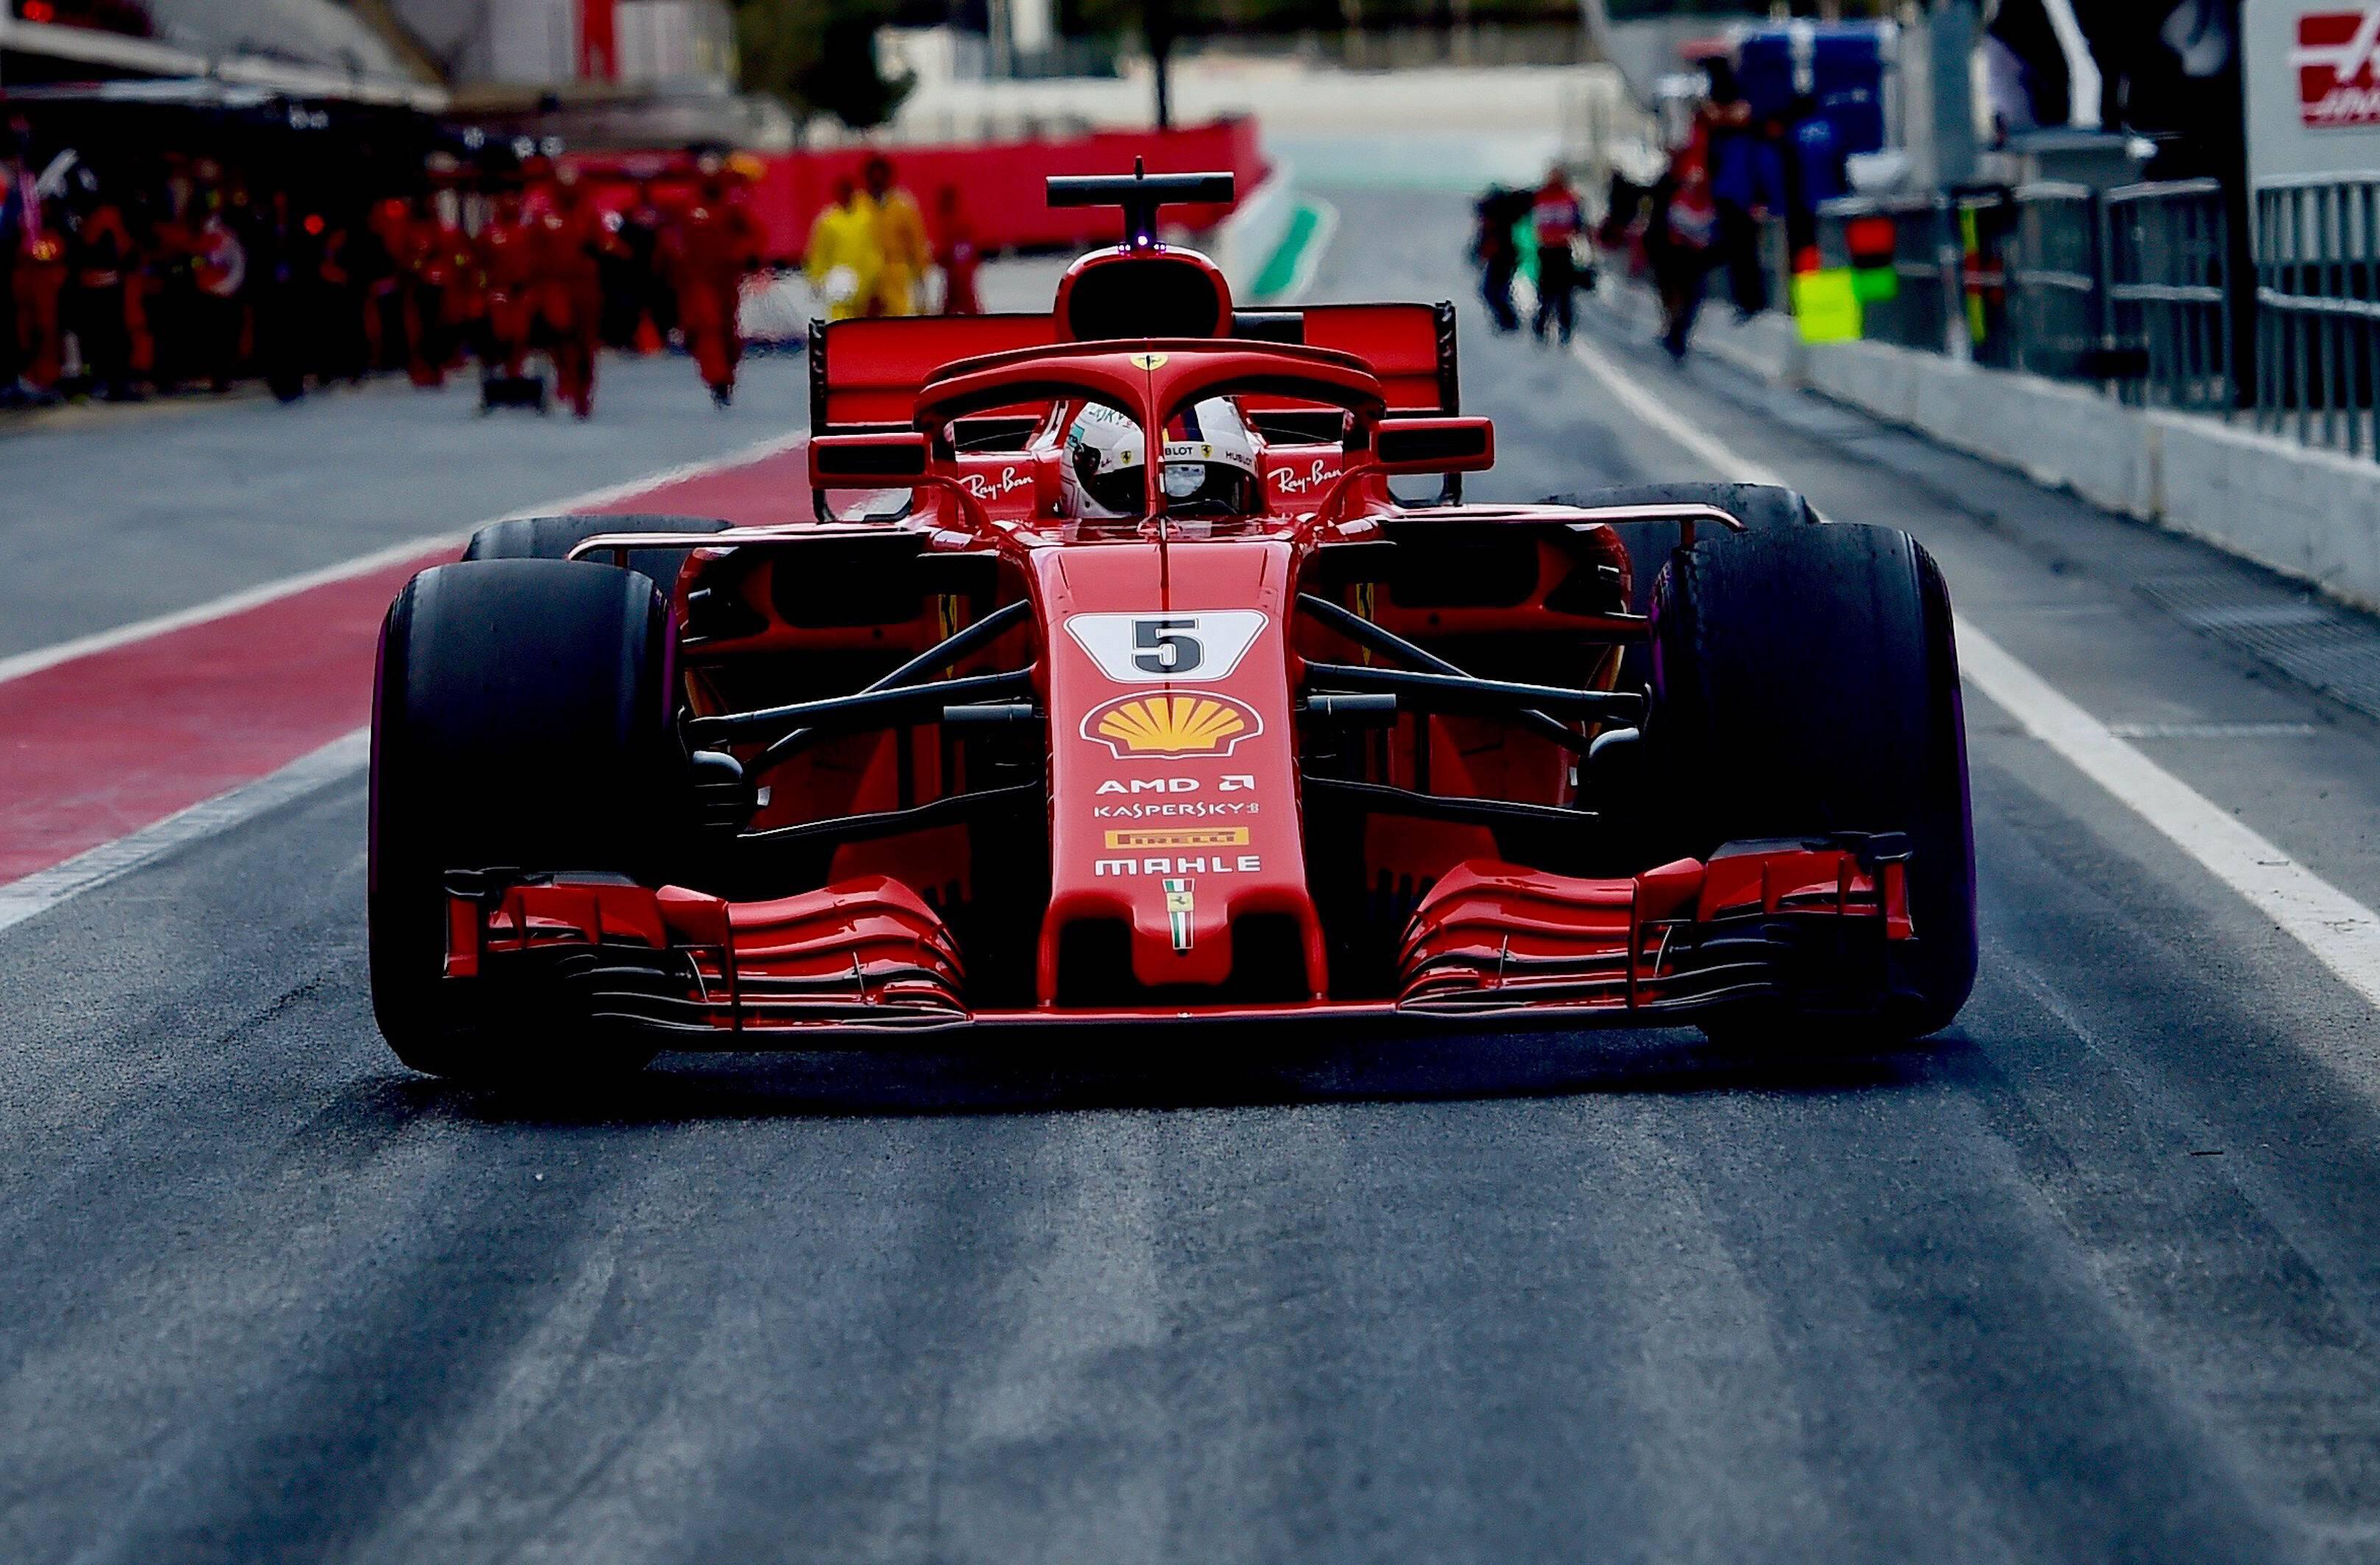 Bild zu Ferrari, Formel 1, Saison 2018, F1, Melbourne, Australien